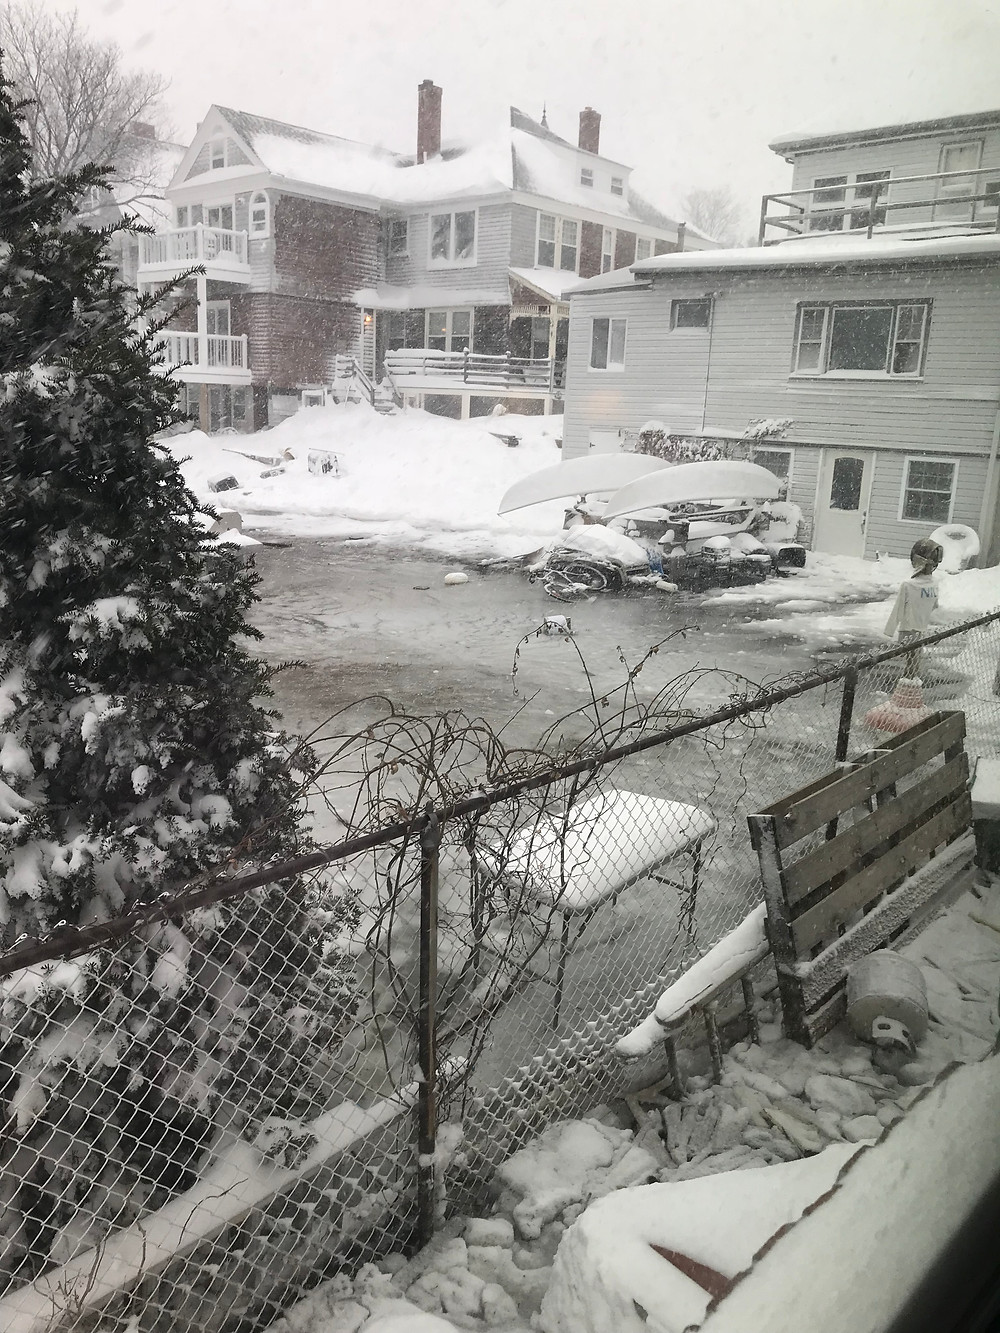 Flooding in winter in Boston 2018, winthrop, ma, international students blog, alien thoughts